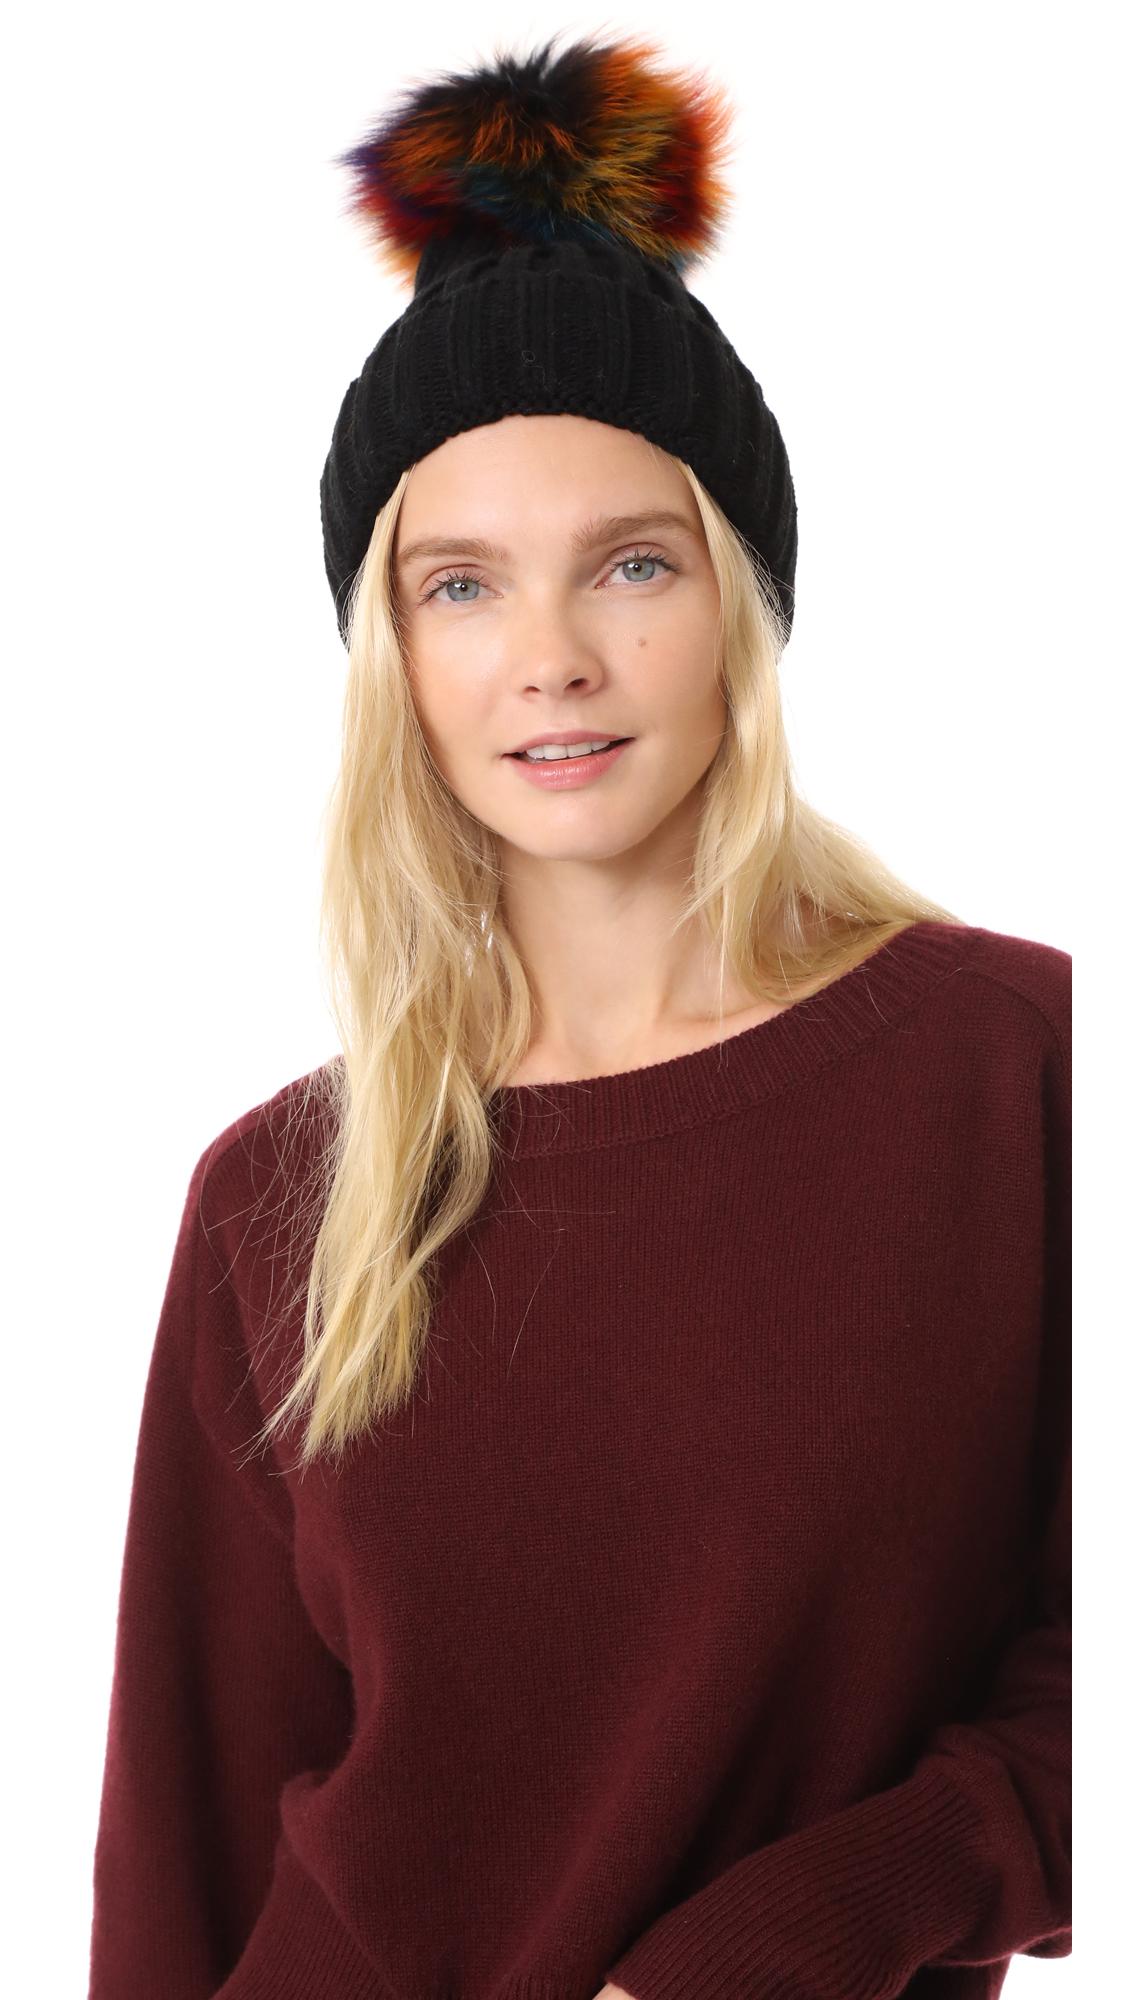 Jocelyn Knit Beanie Pom Hat - Black/Bright Multi